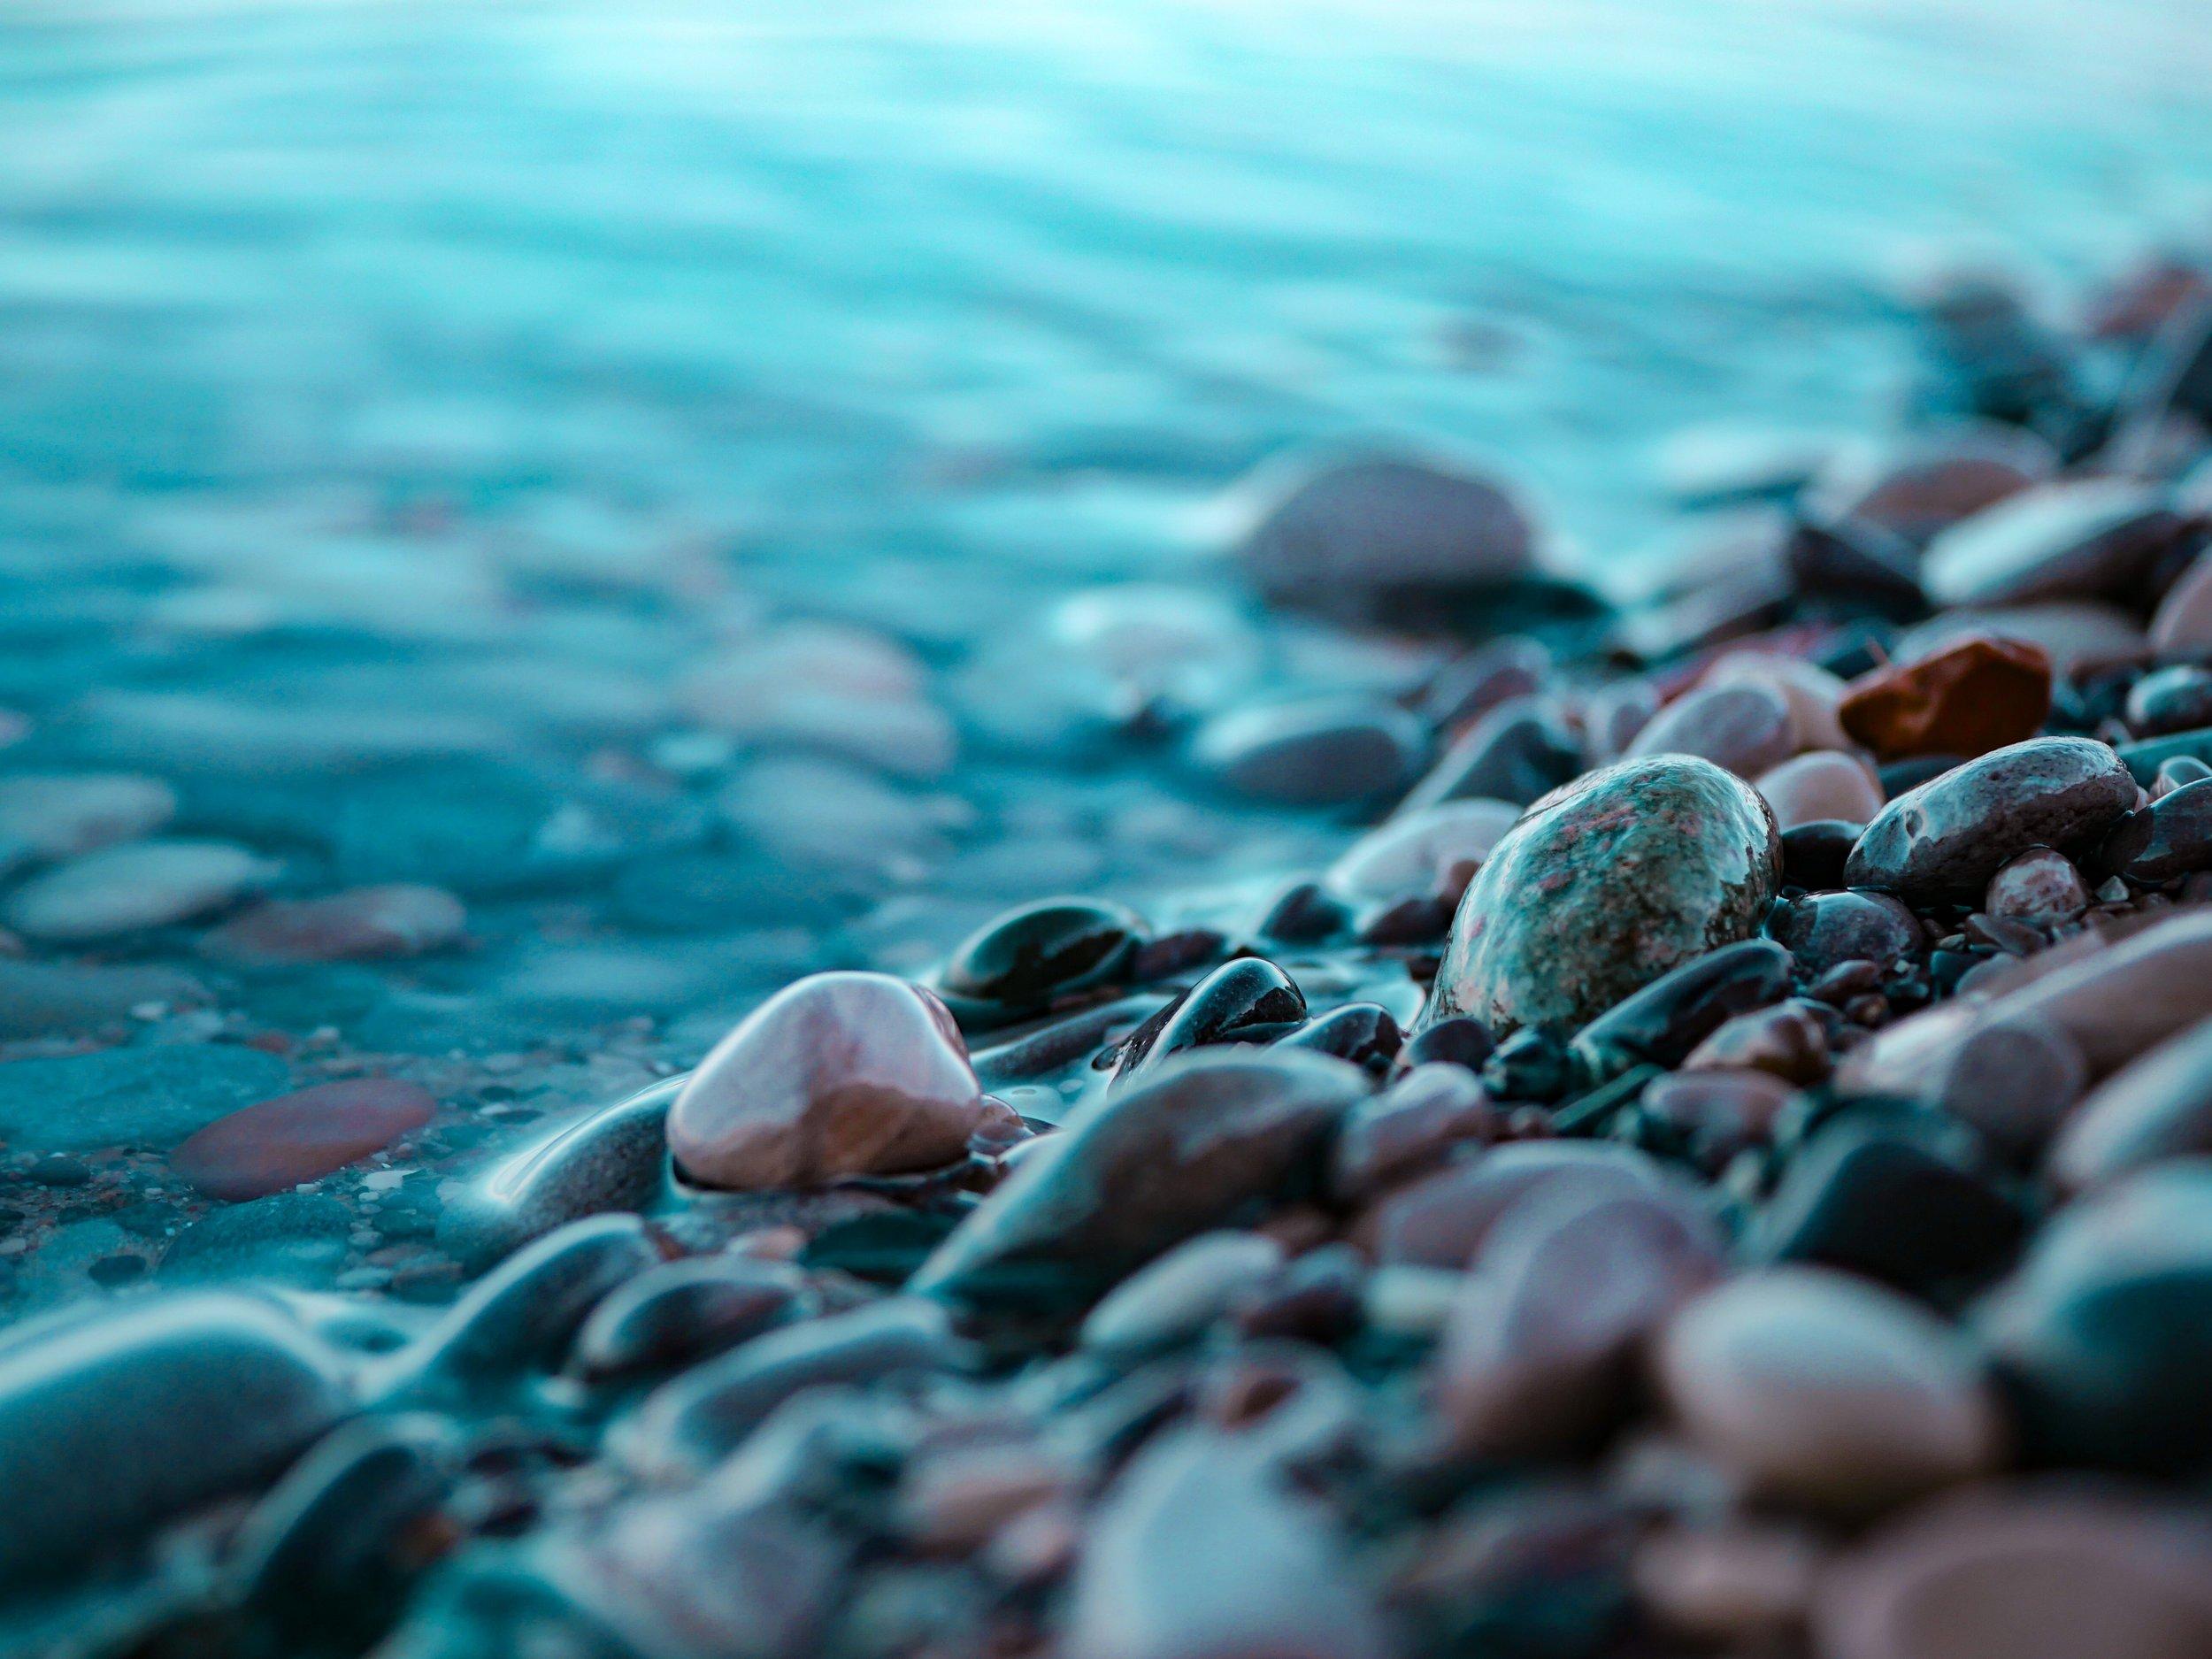 smooth pebbles and calm sea